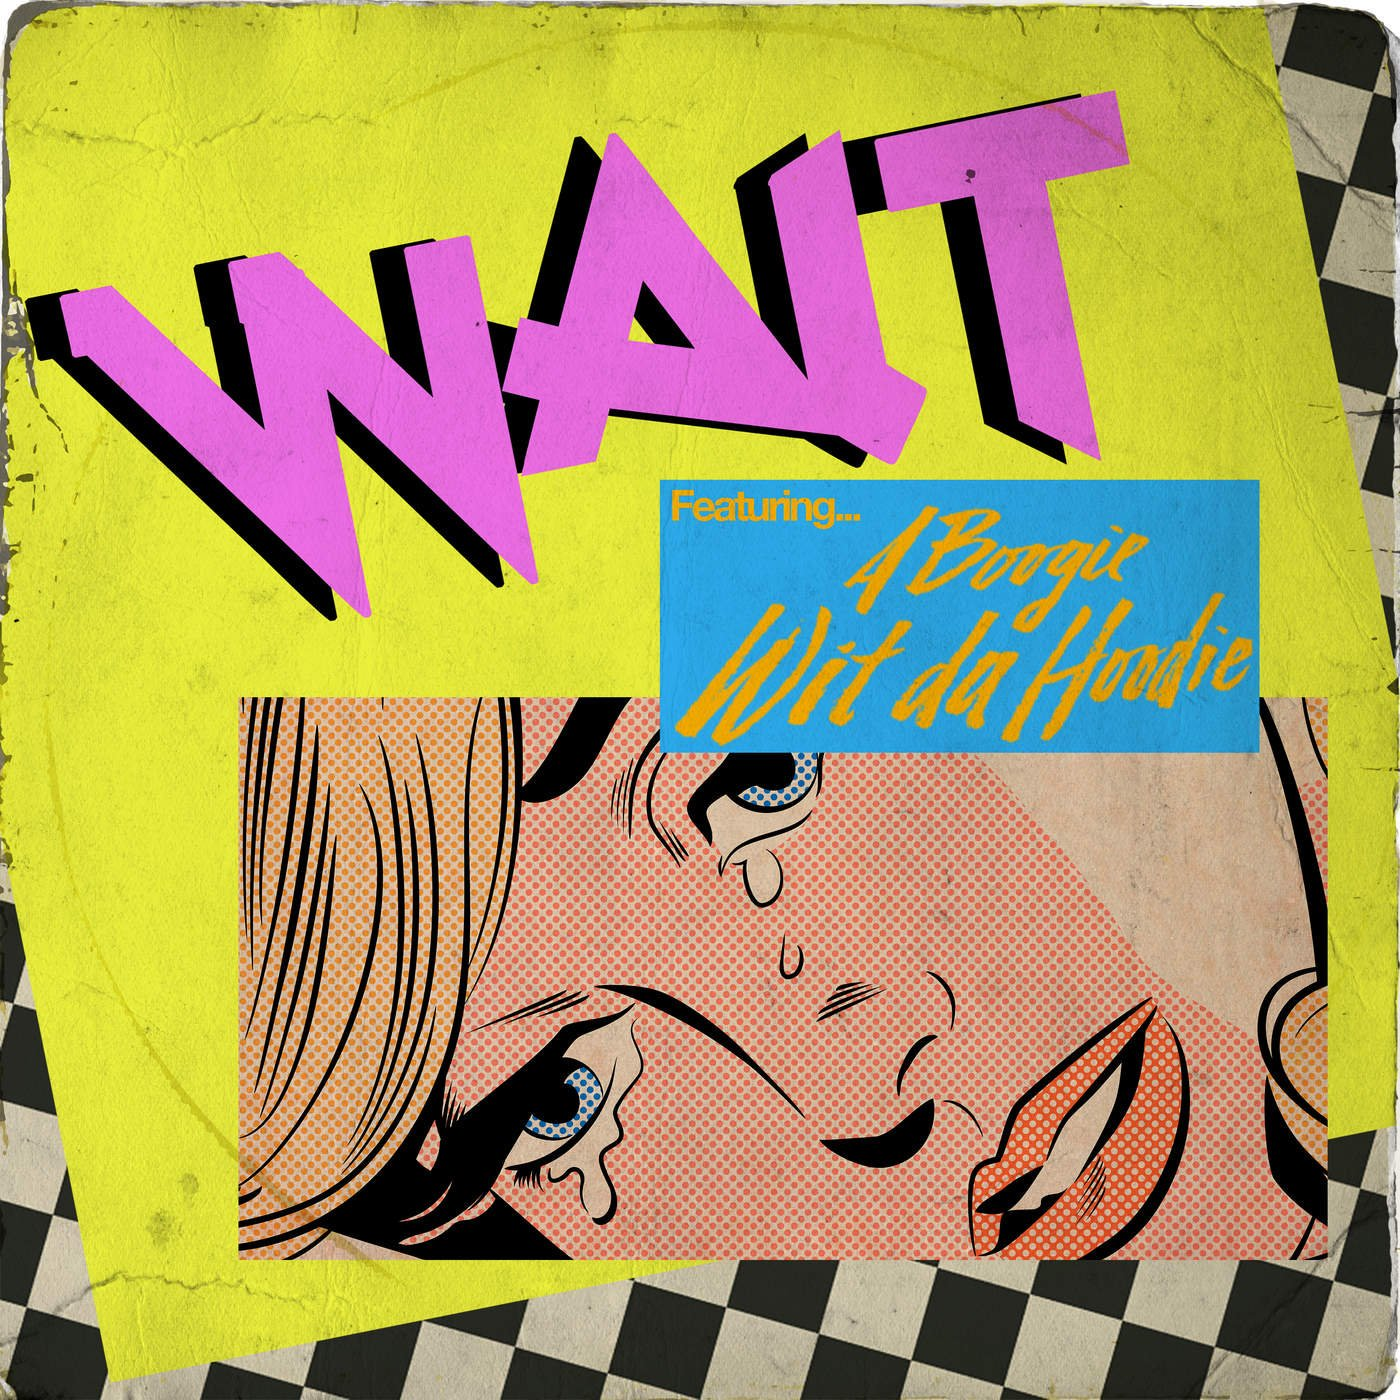 New remix of #M5Wait ft. @artisthbtl is out now! https://t.co/qwnHsSvHdS https://t.co/rq4tBpo8Dd